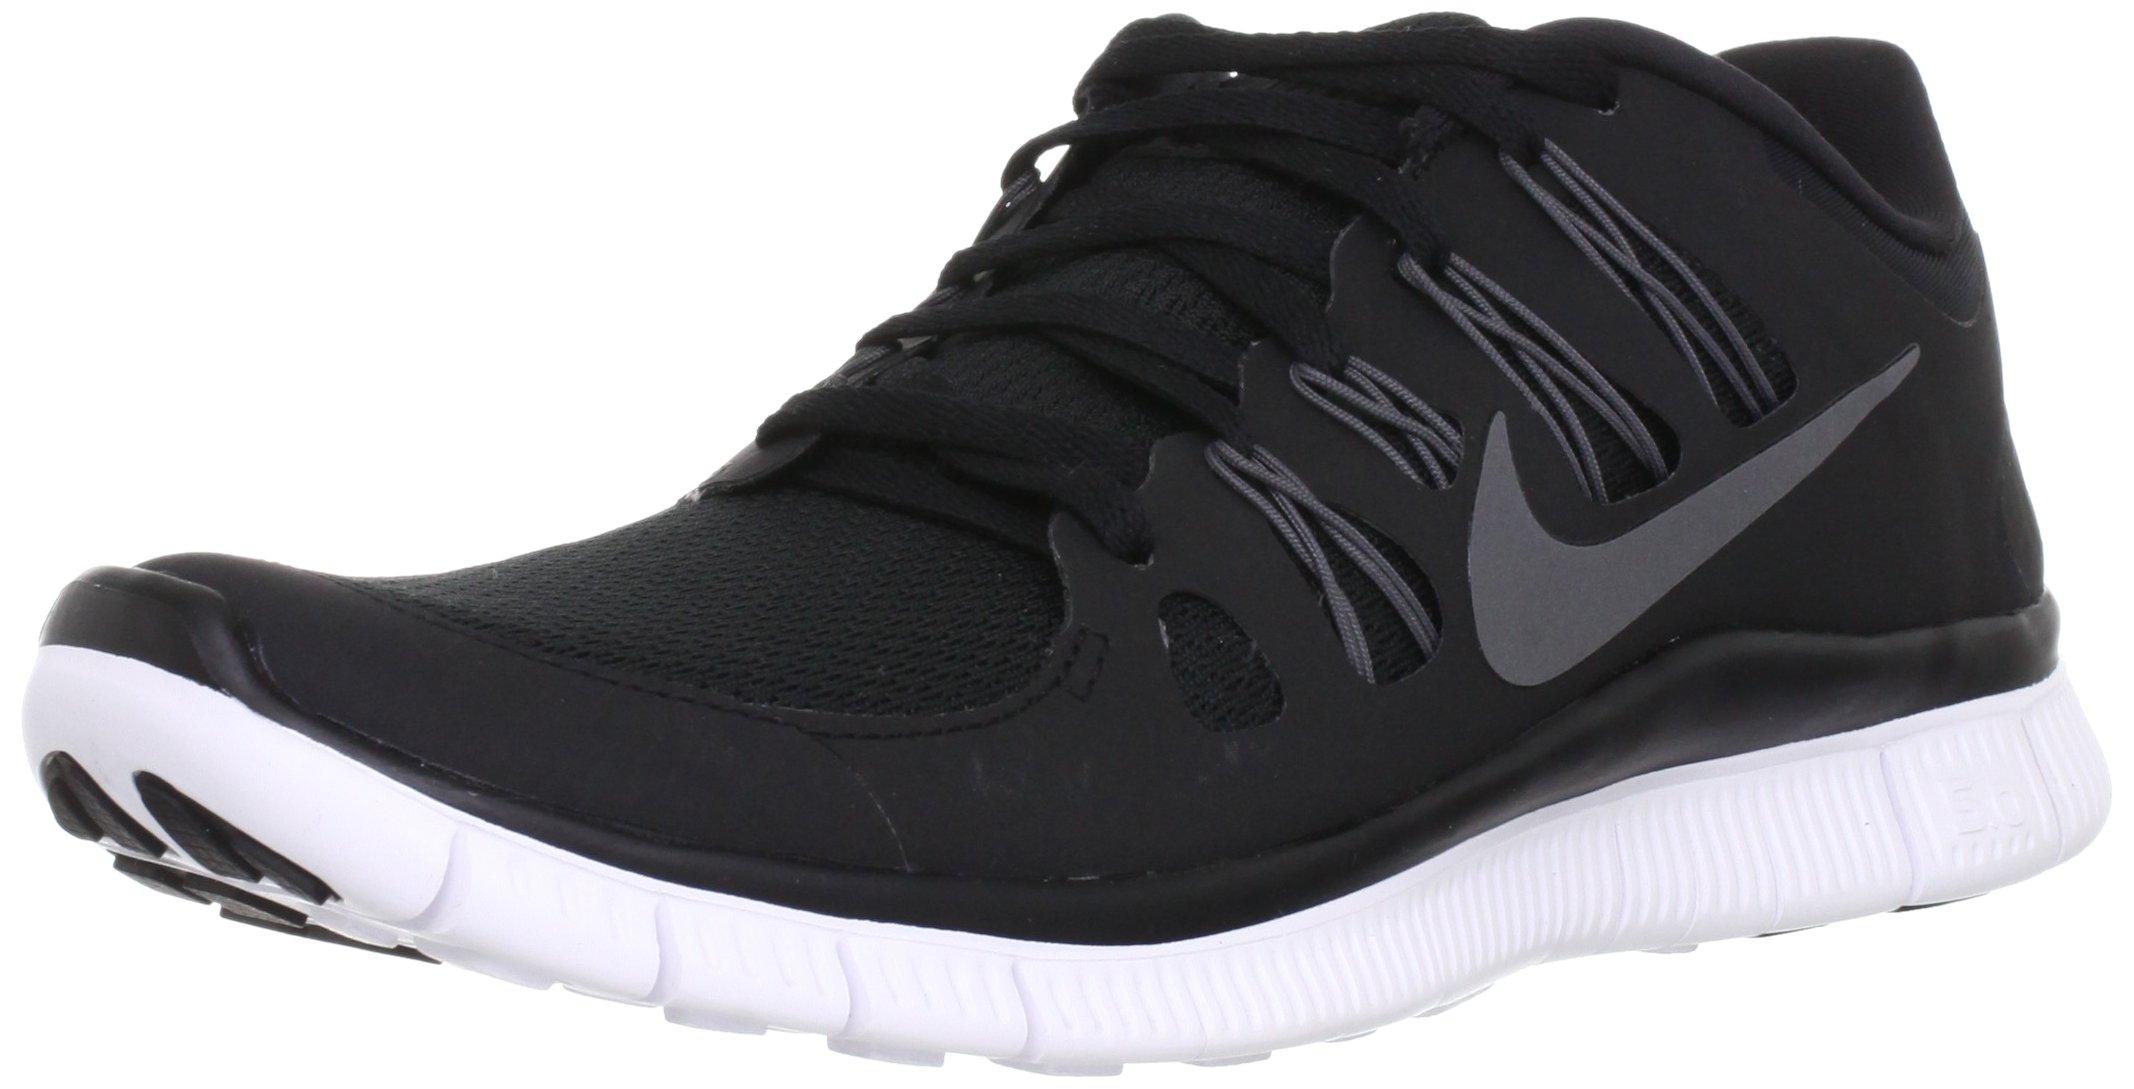 71gBUpa NqL - Nike Men's Free 5.0+ Running Shoes